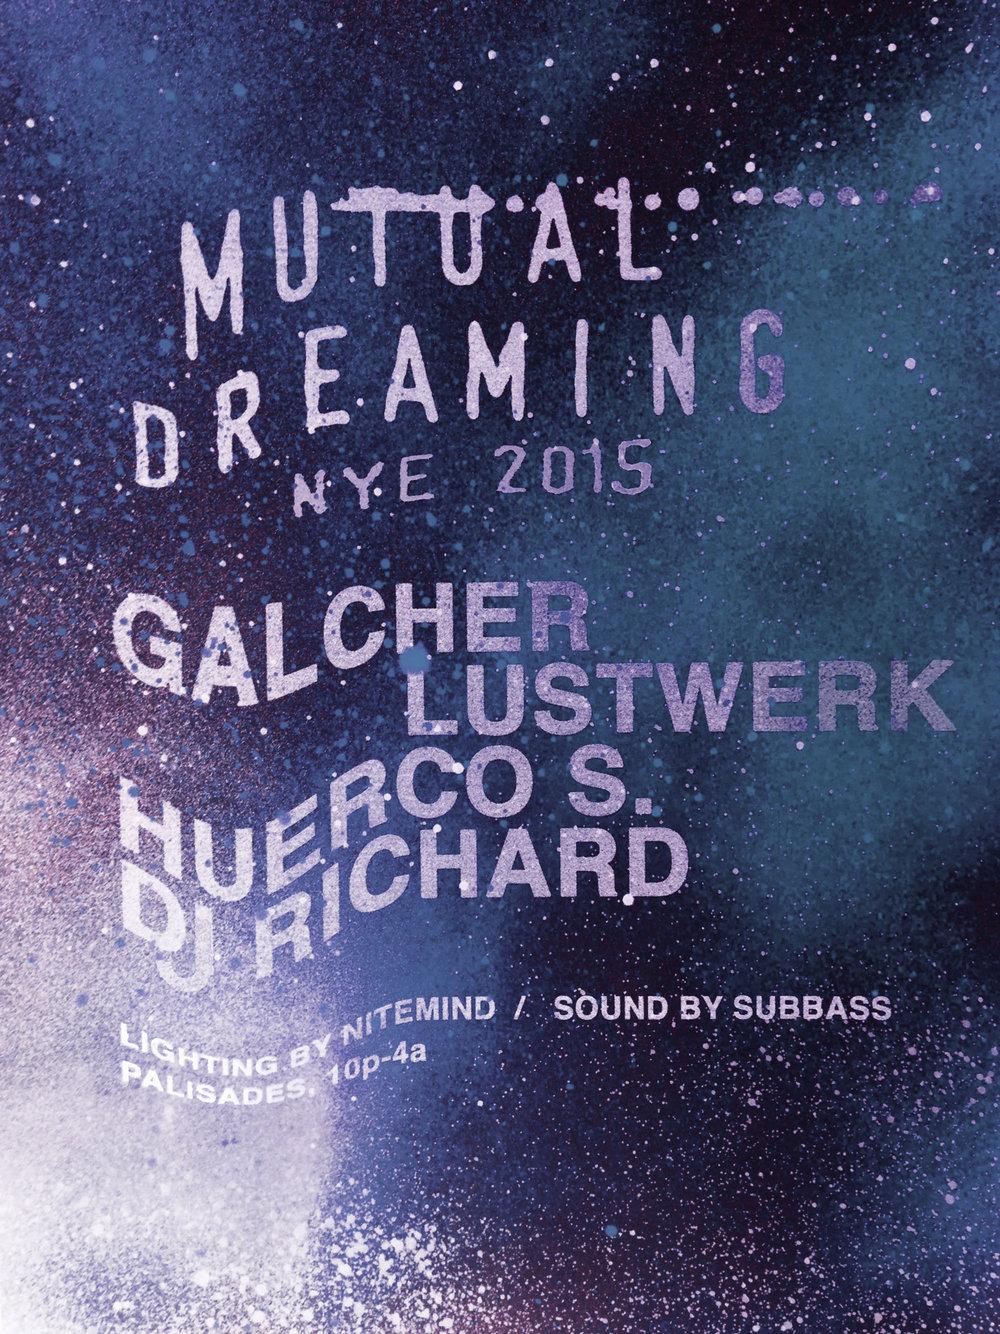 Mutual Dreaming NYE: Galcher Lustwerk, Huerco S., DJ Richard  2015